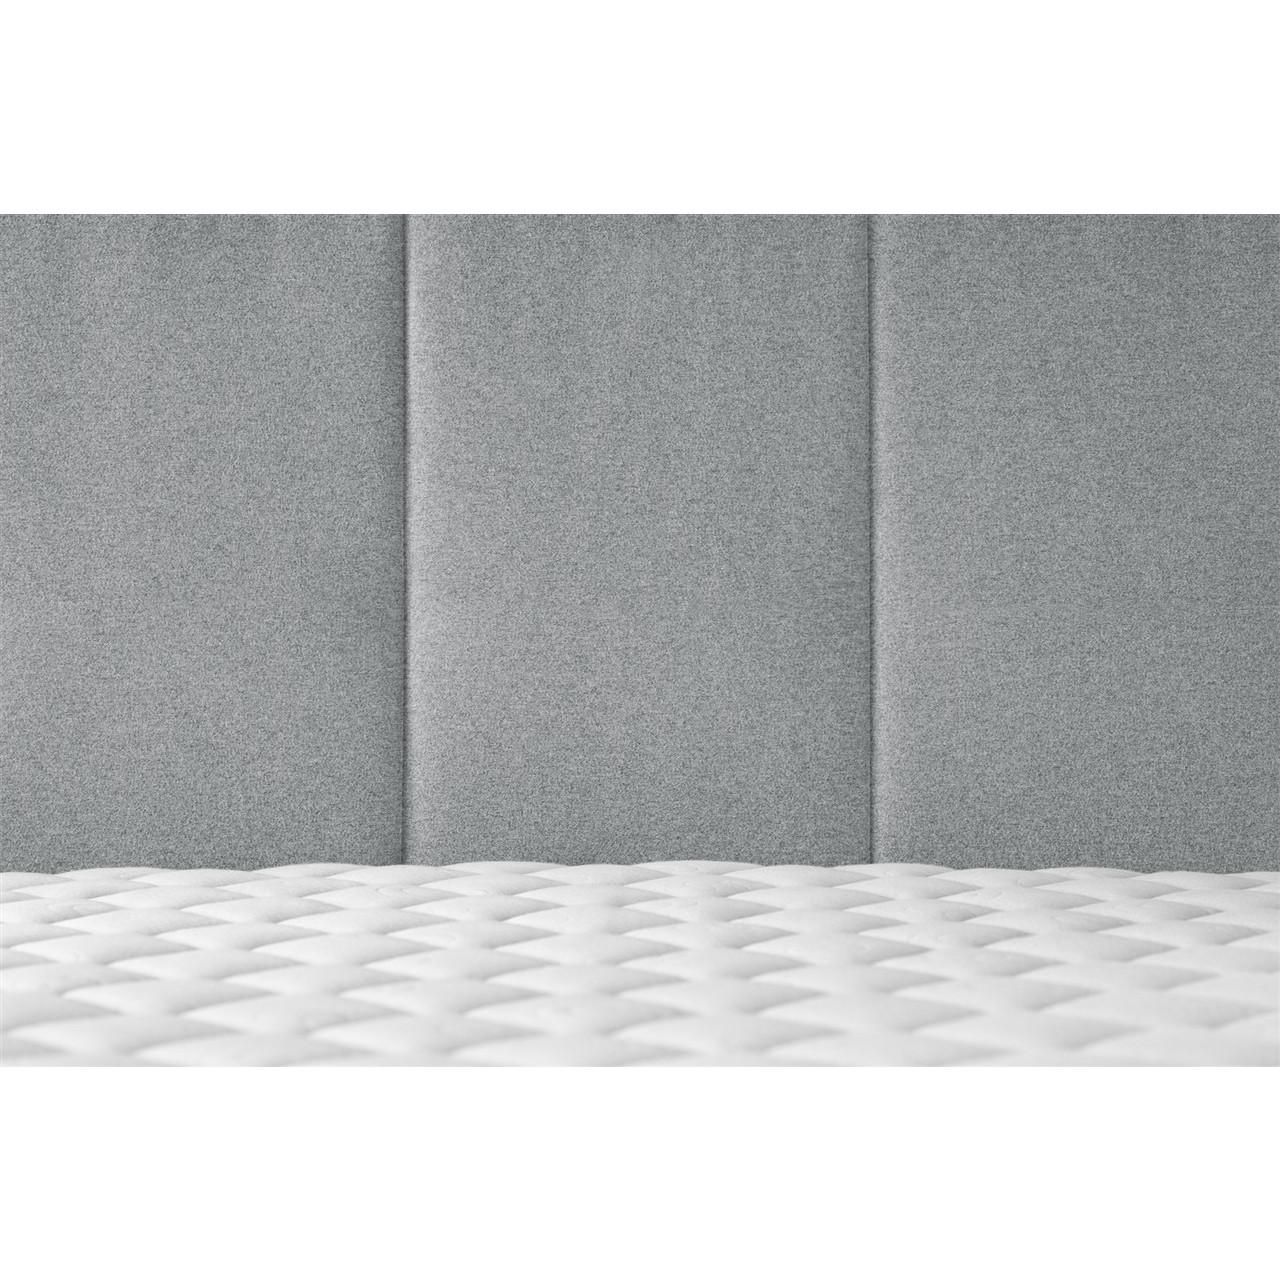 Bett Allure | Grau-140 x 200 cm